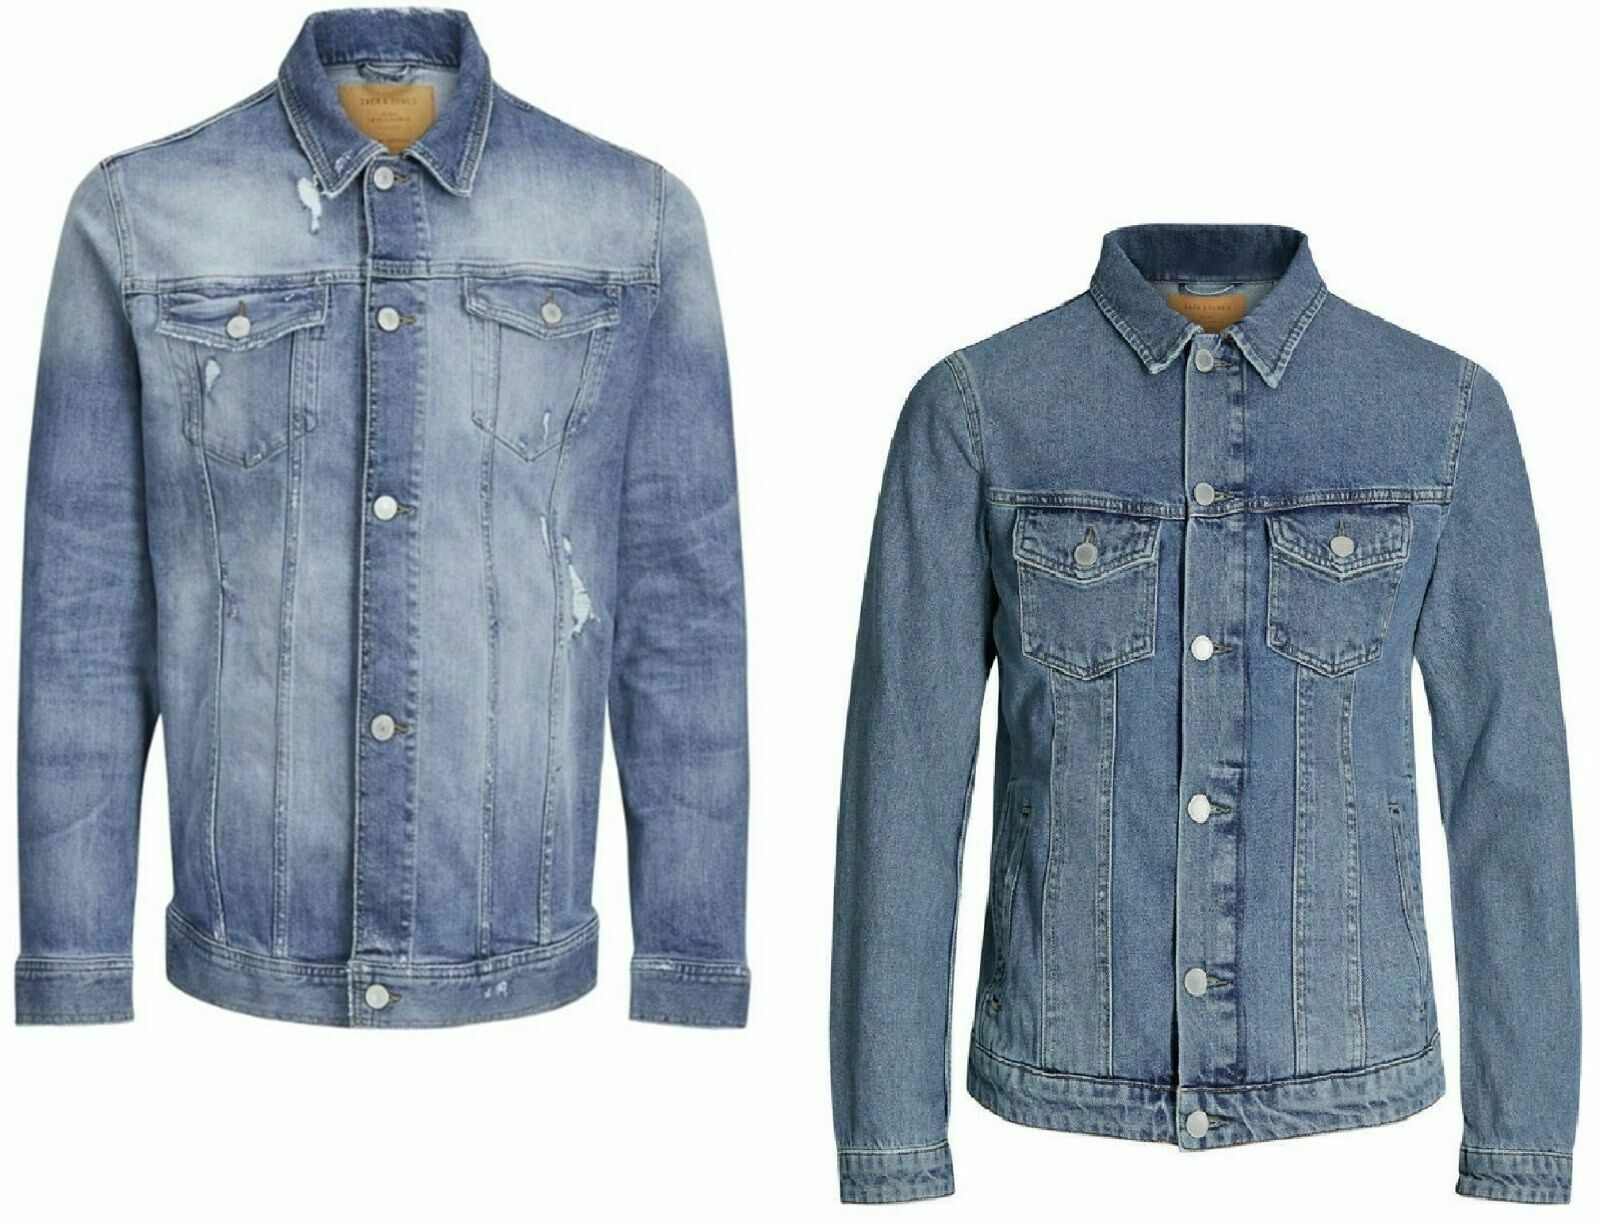 Jack /& Jones Mens Distressed Western Denim Vintage Blue Jean Jacket S 2XL